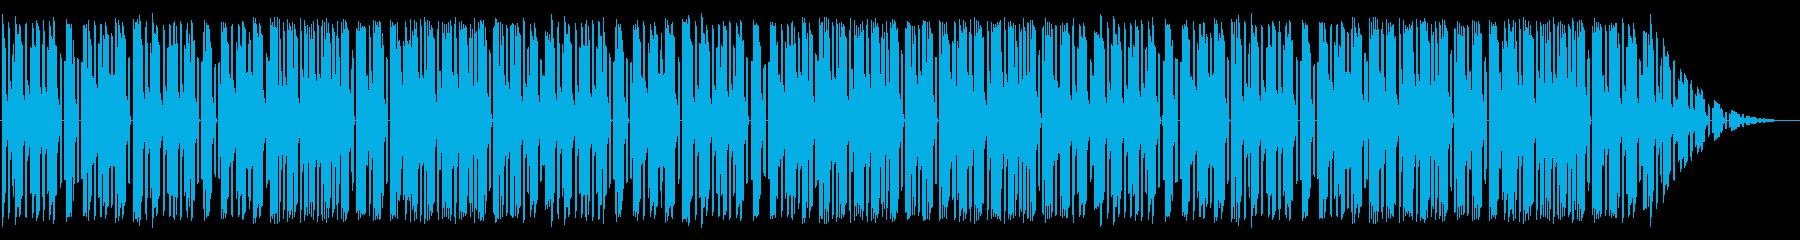 NES 汎用 C04-1(ステージ3) の再生済みの波形